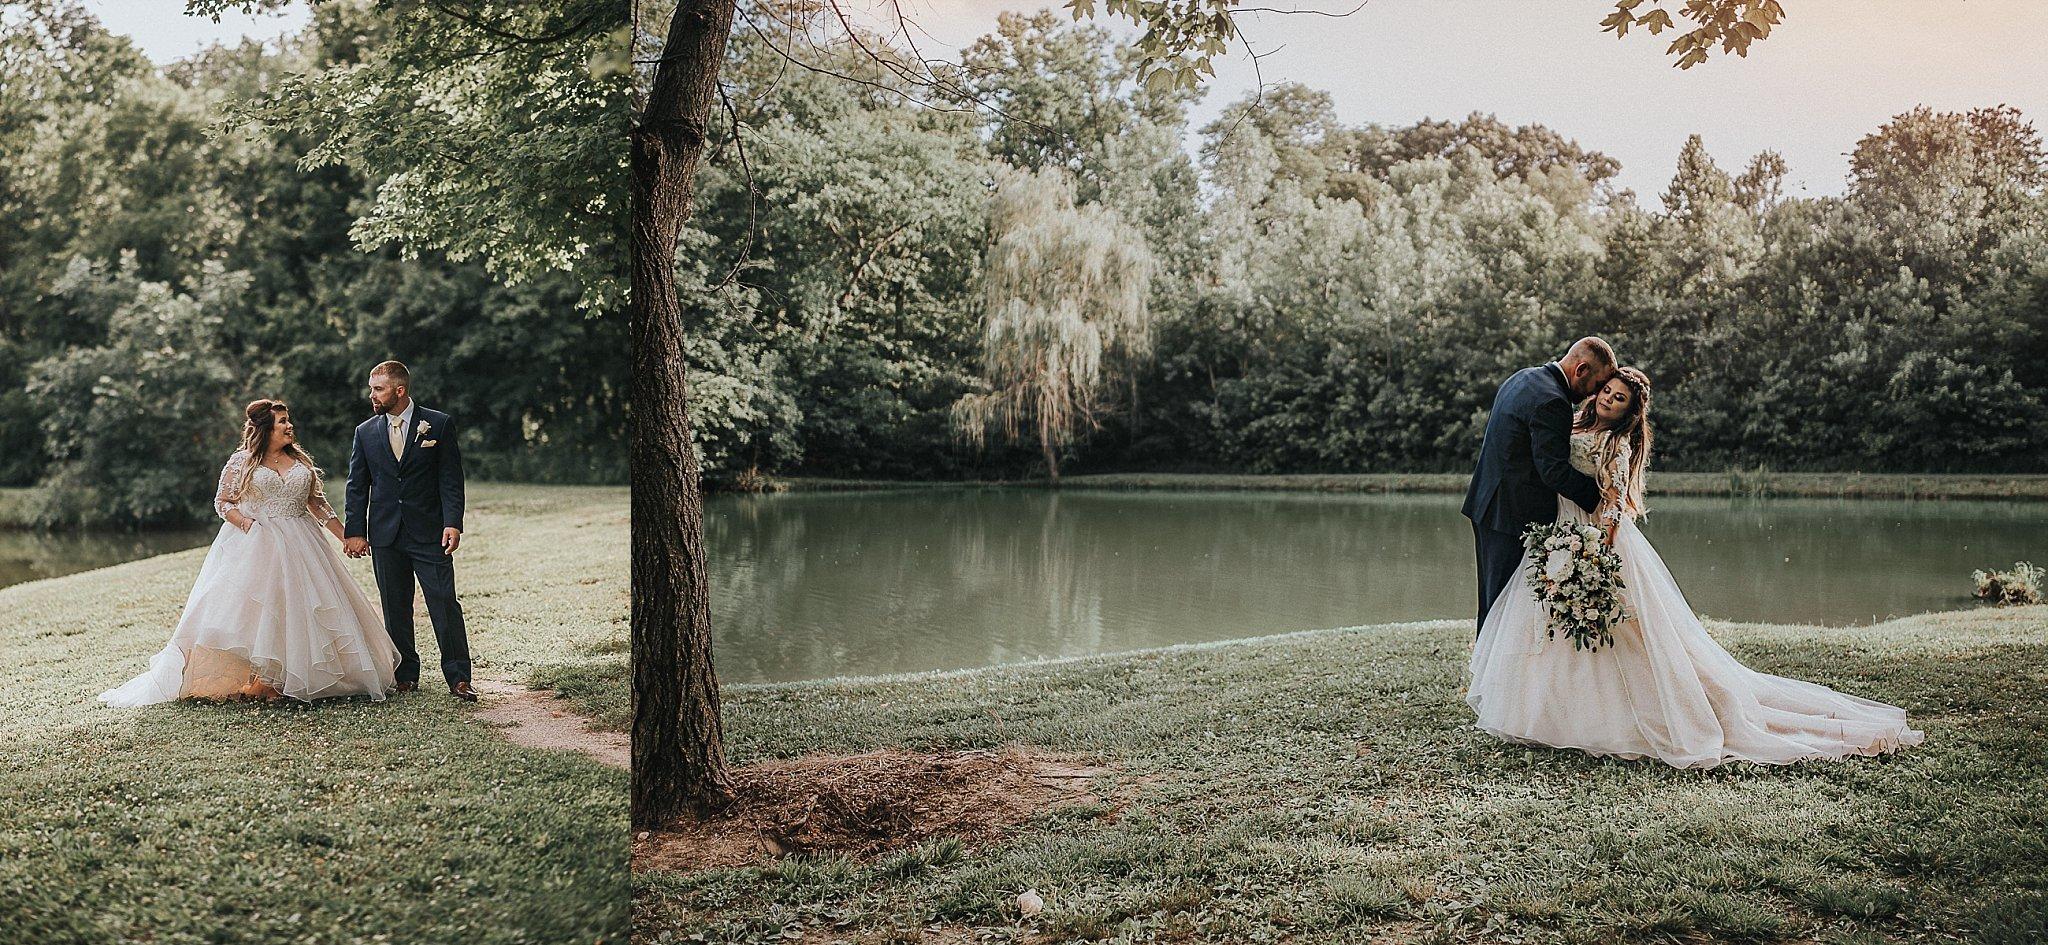 St. Louis Wedding Photography